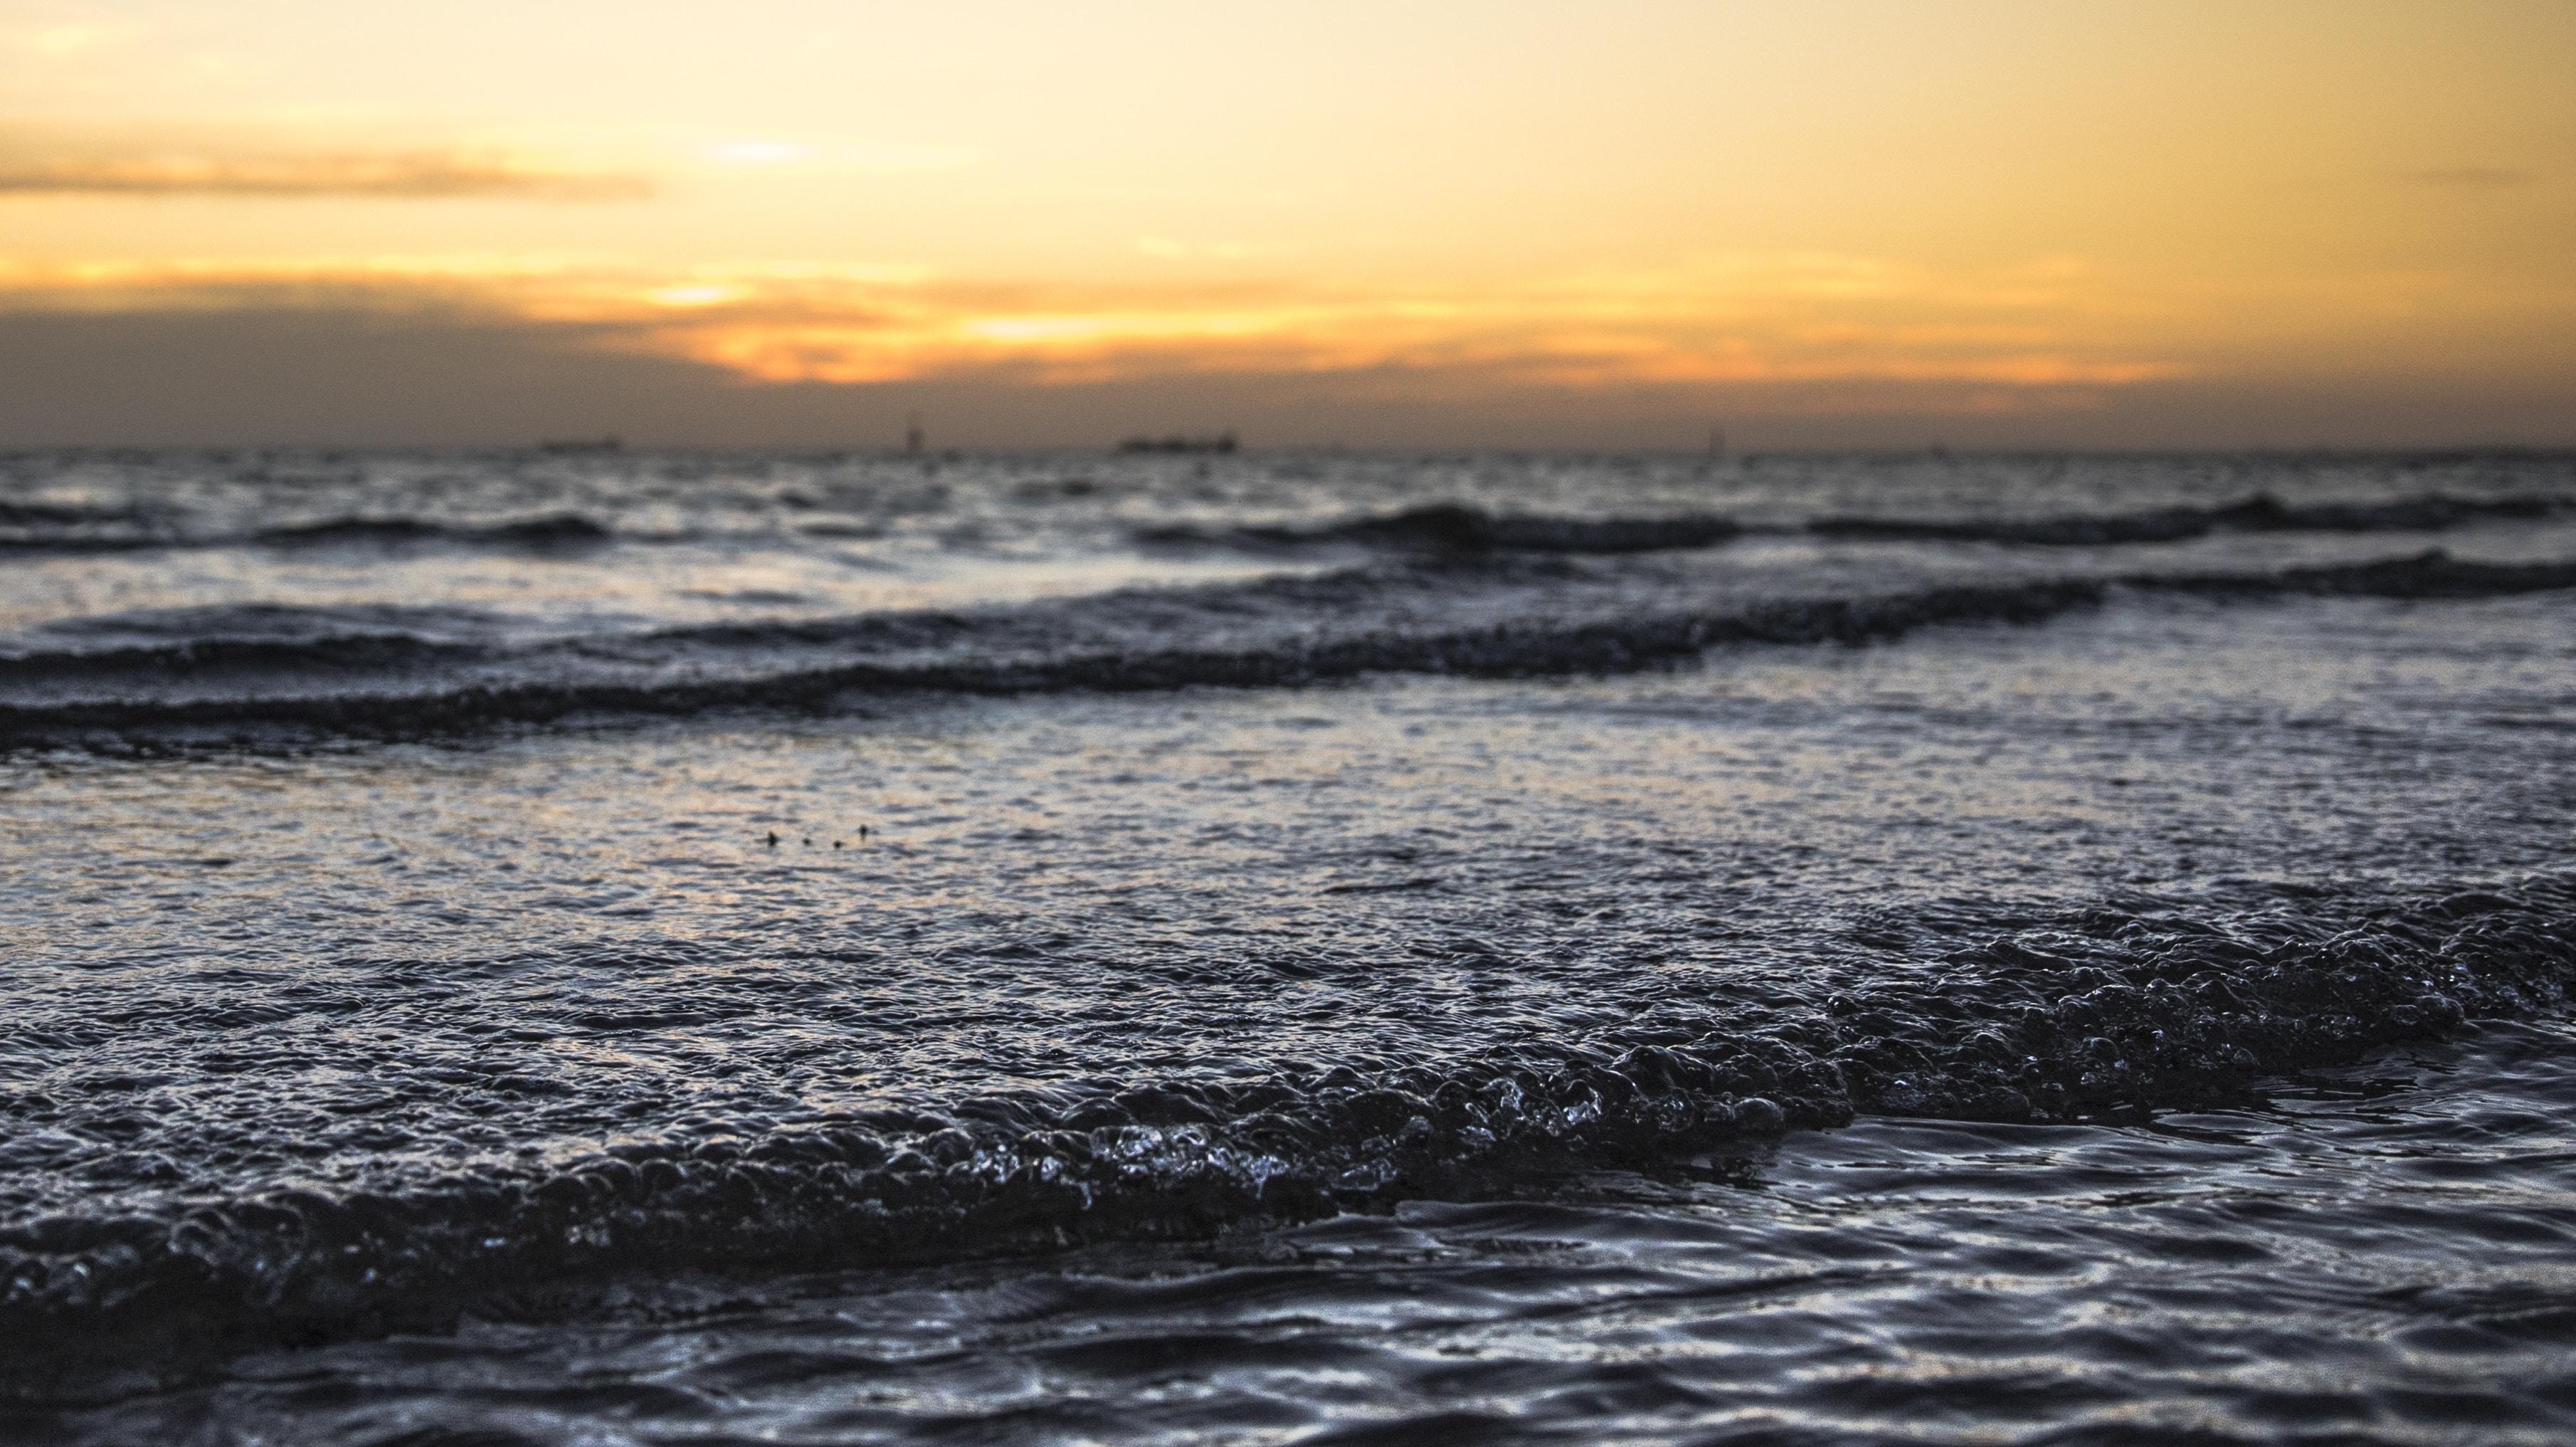 sea wave under sunset